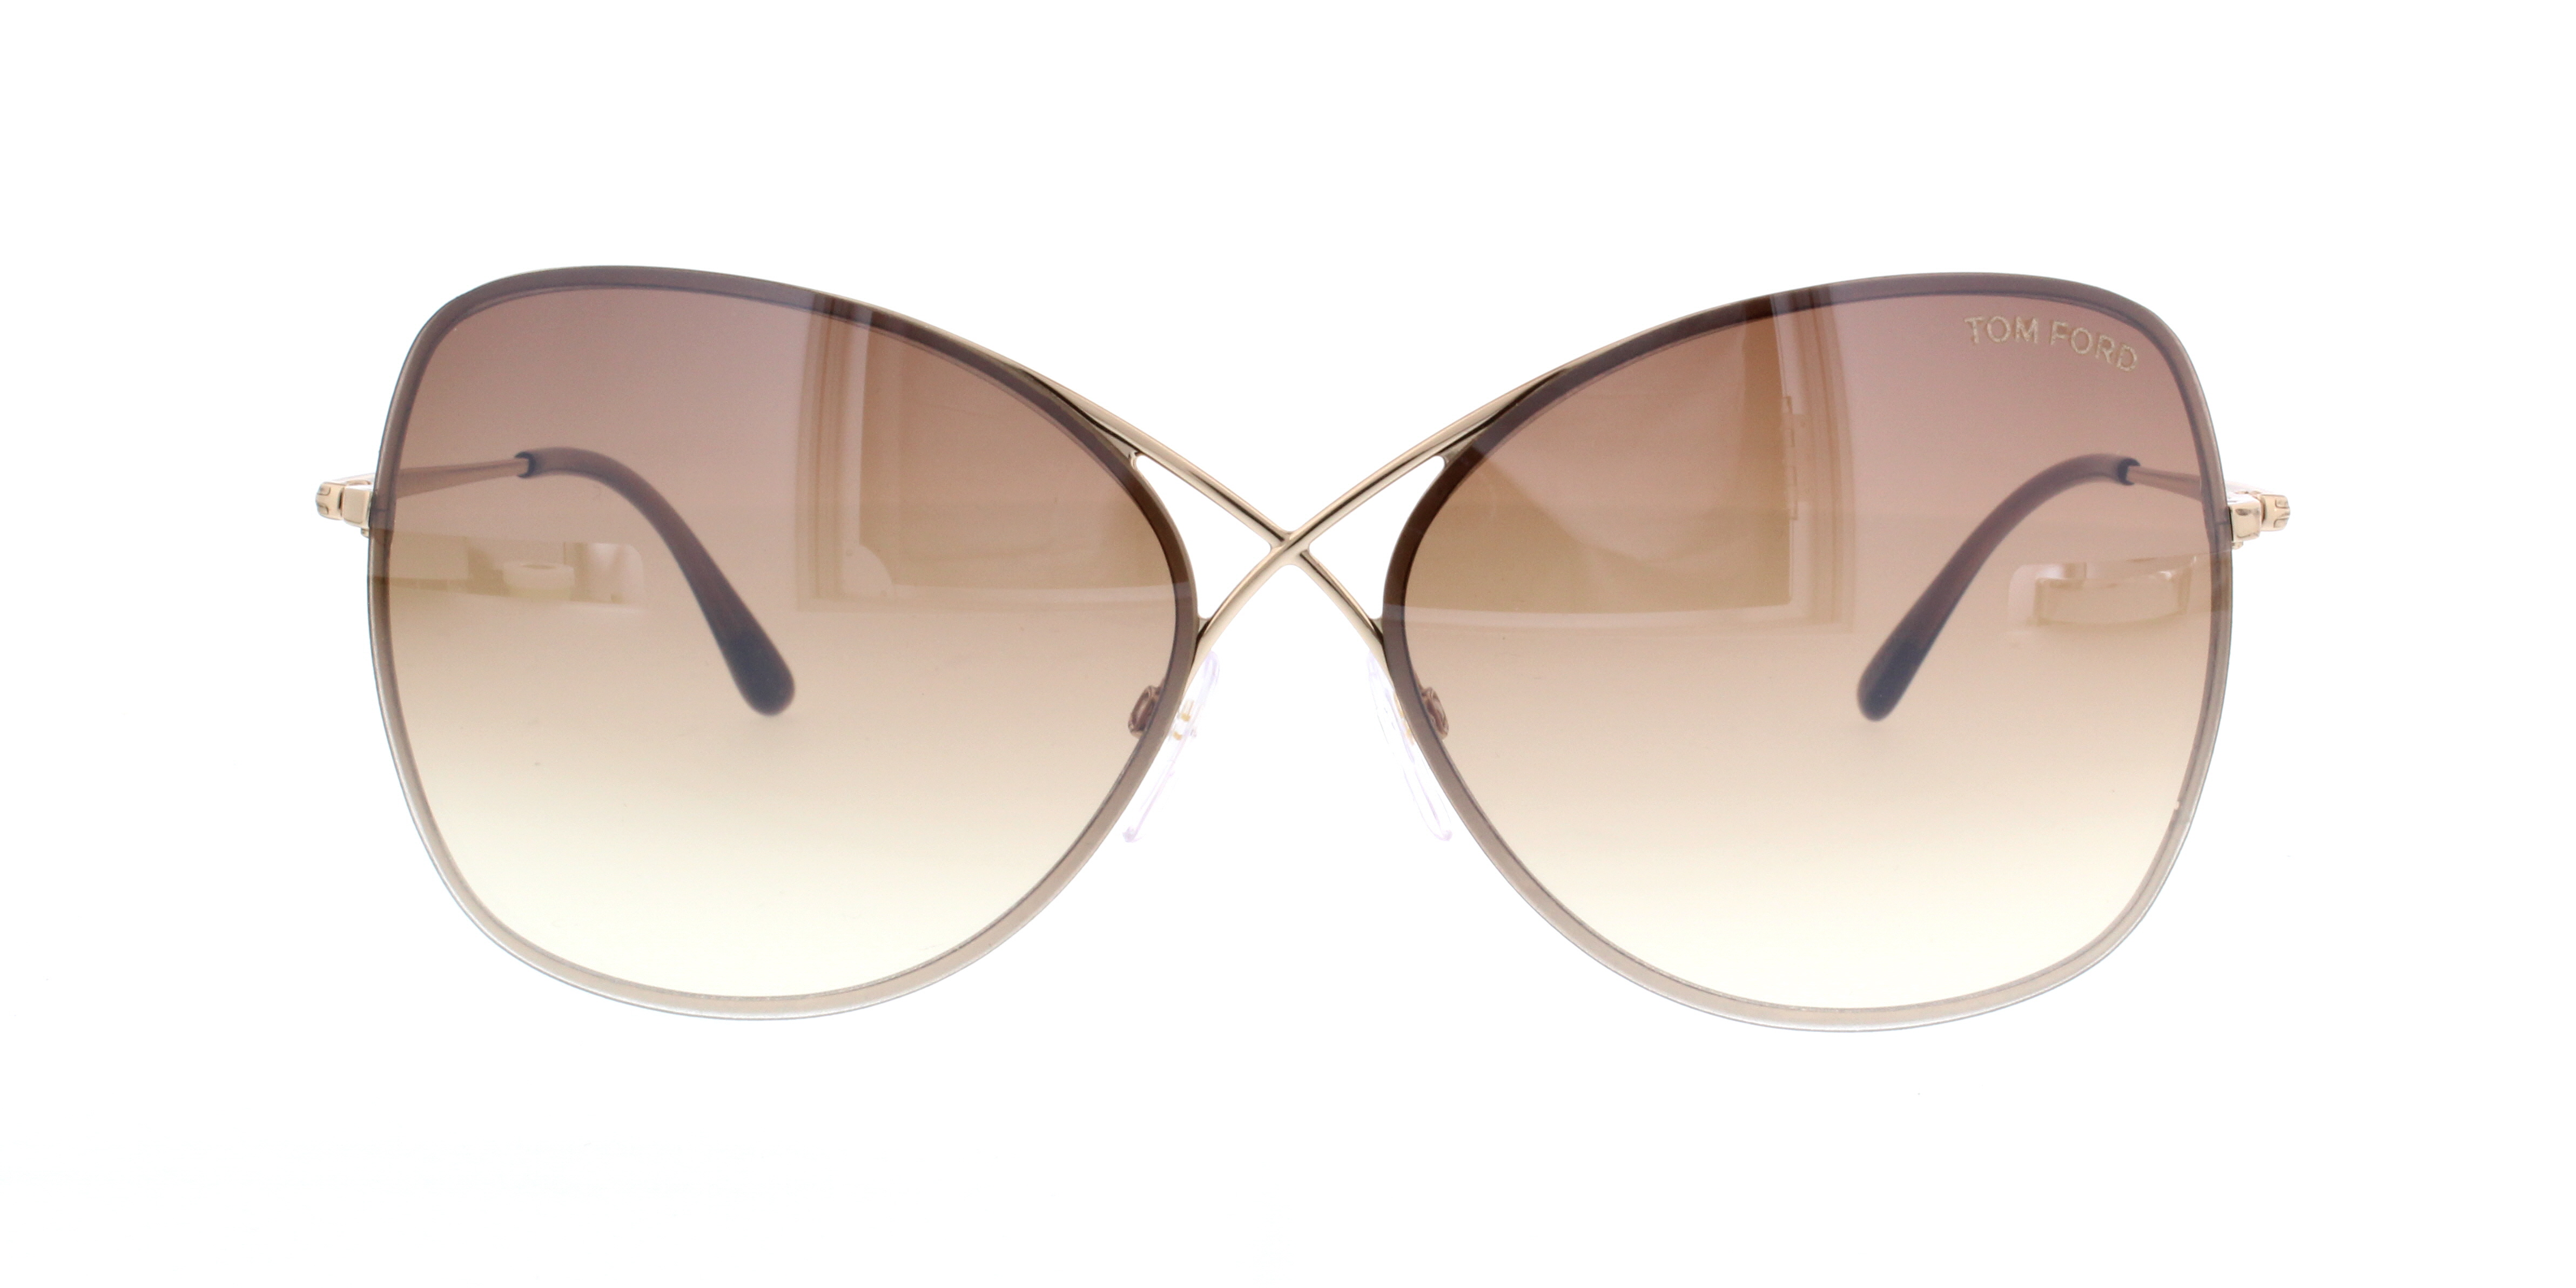 eyewear normal men gallery for lyst metal frames accessories product eyeglasses black acetate tom in clubmaster optical ford